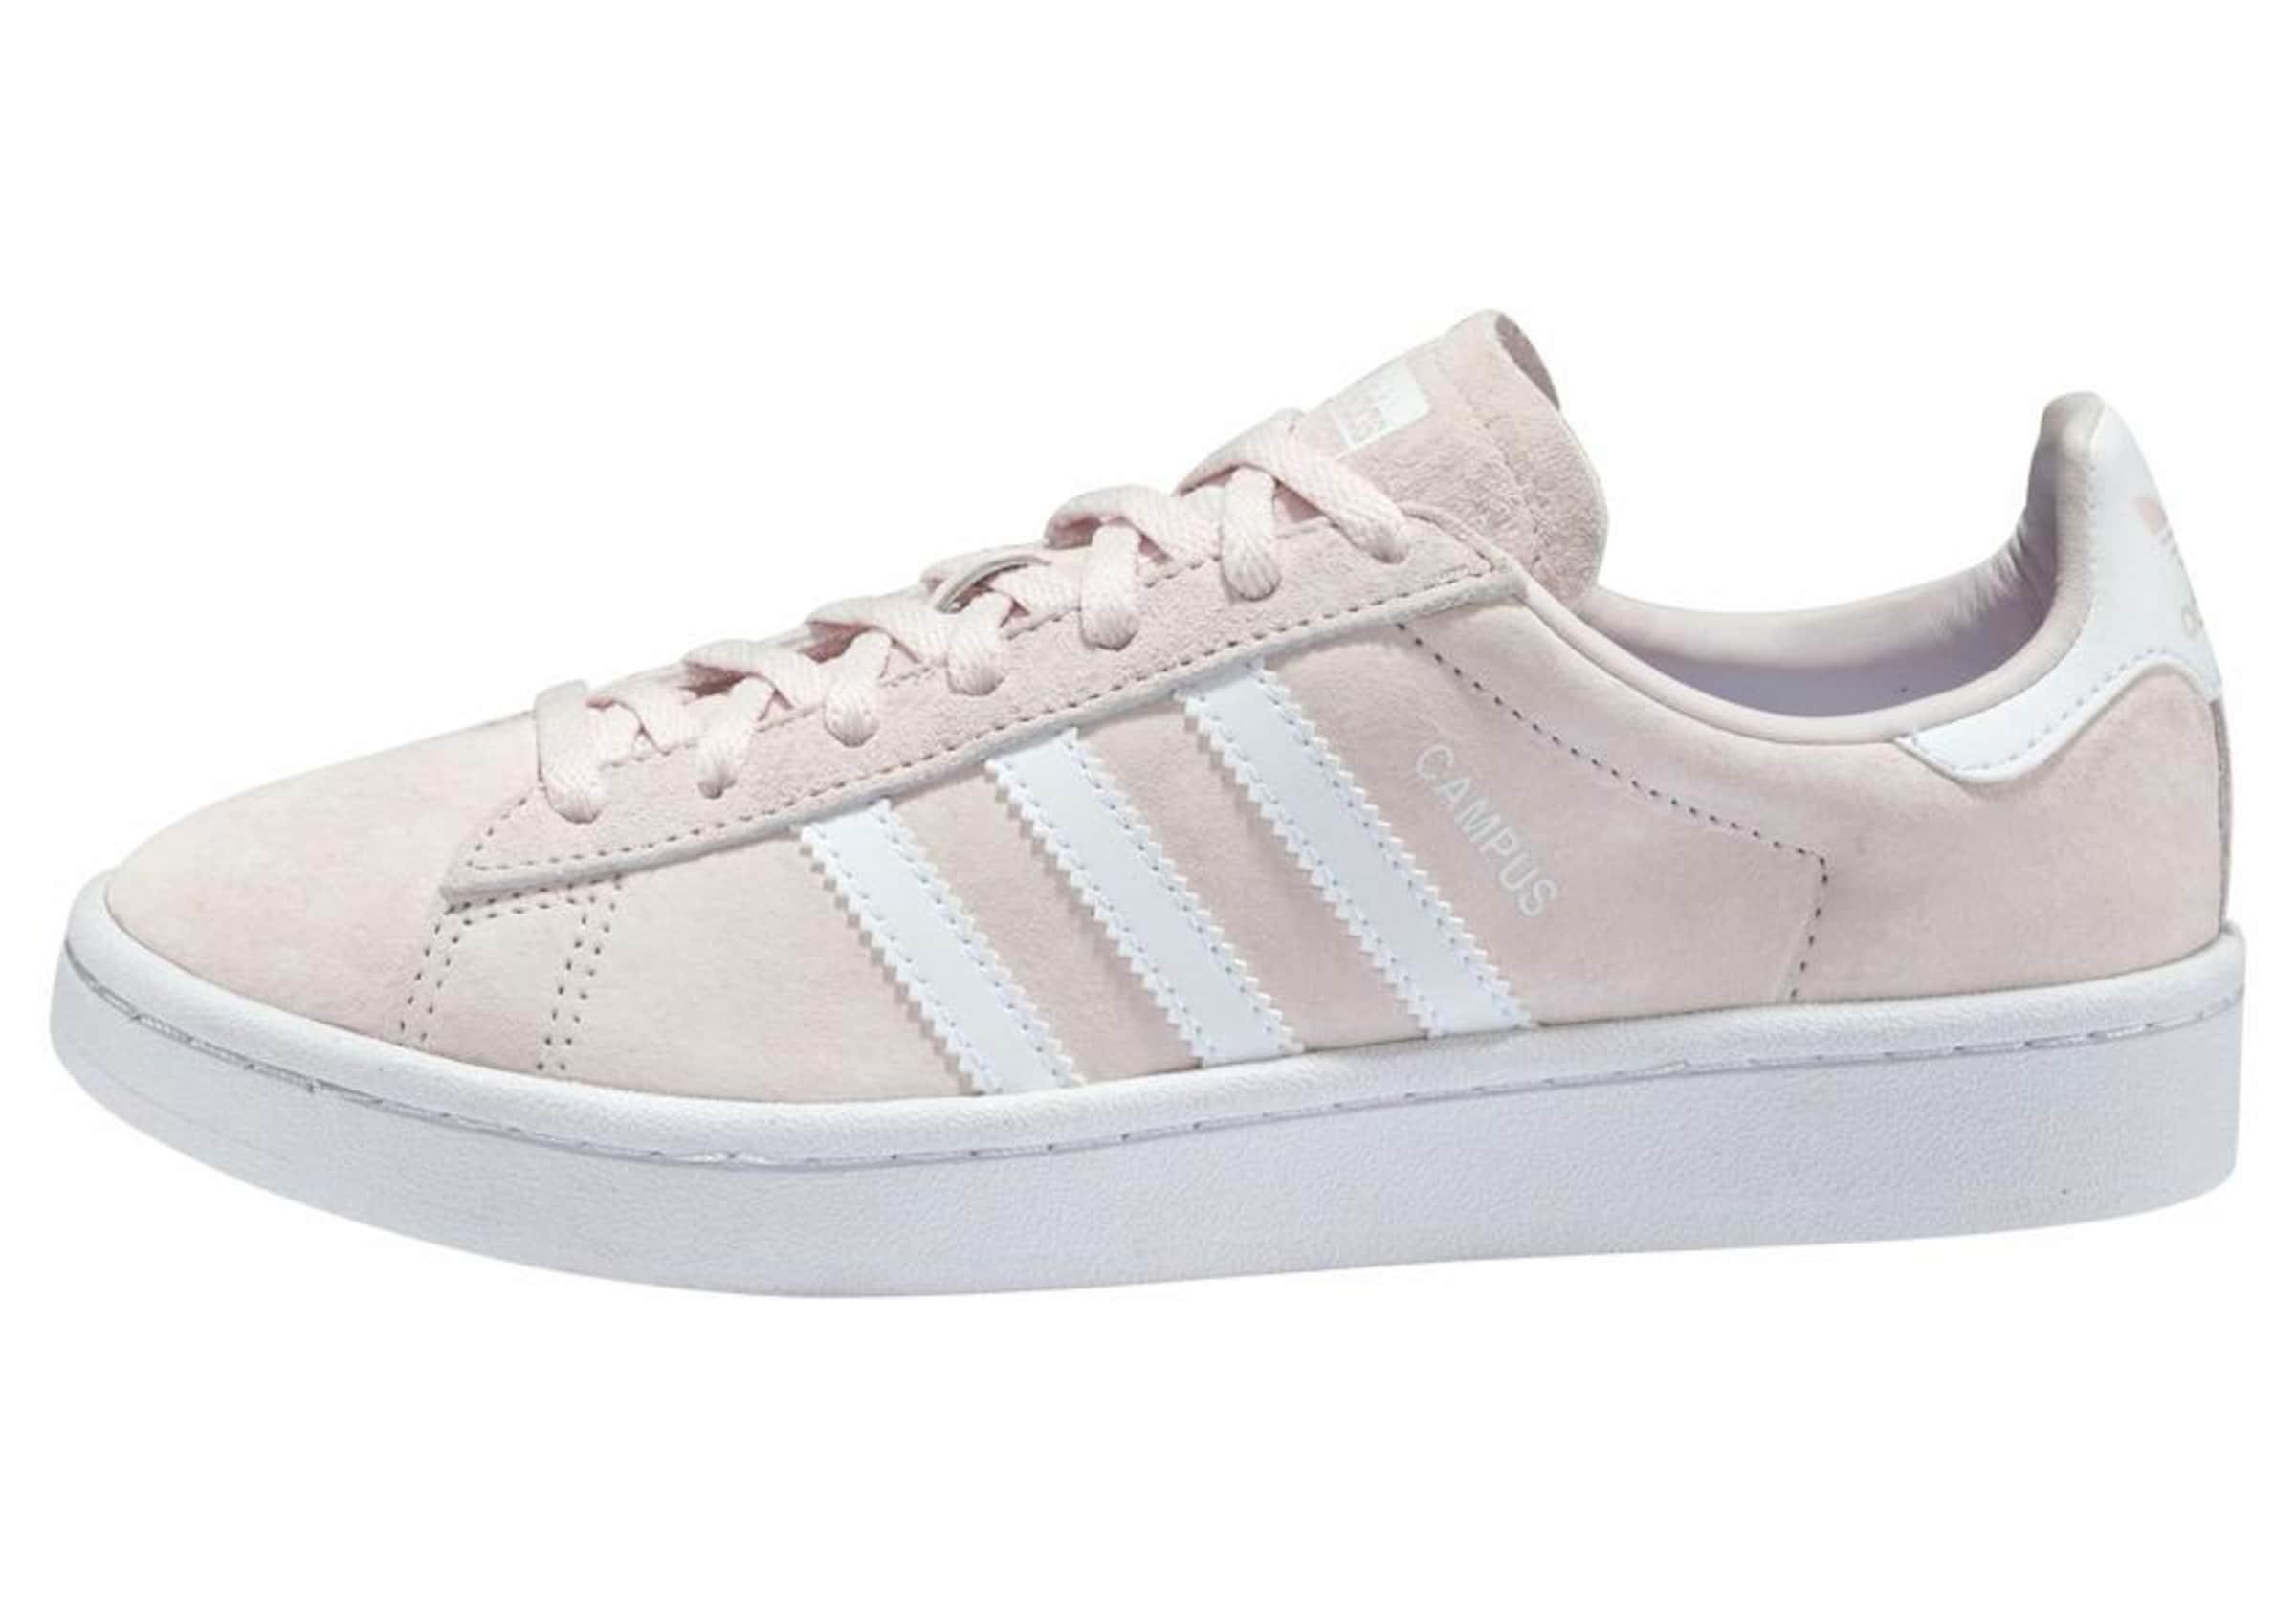 ADIDAS ORIGINALS Sneaker Campus W Hohe Qualität